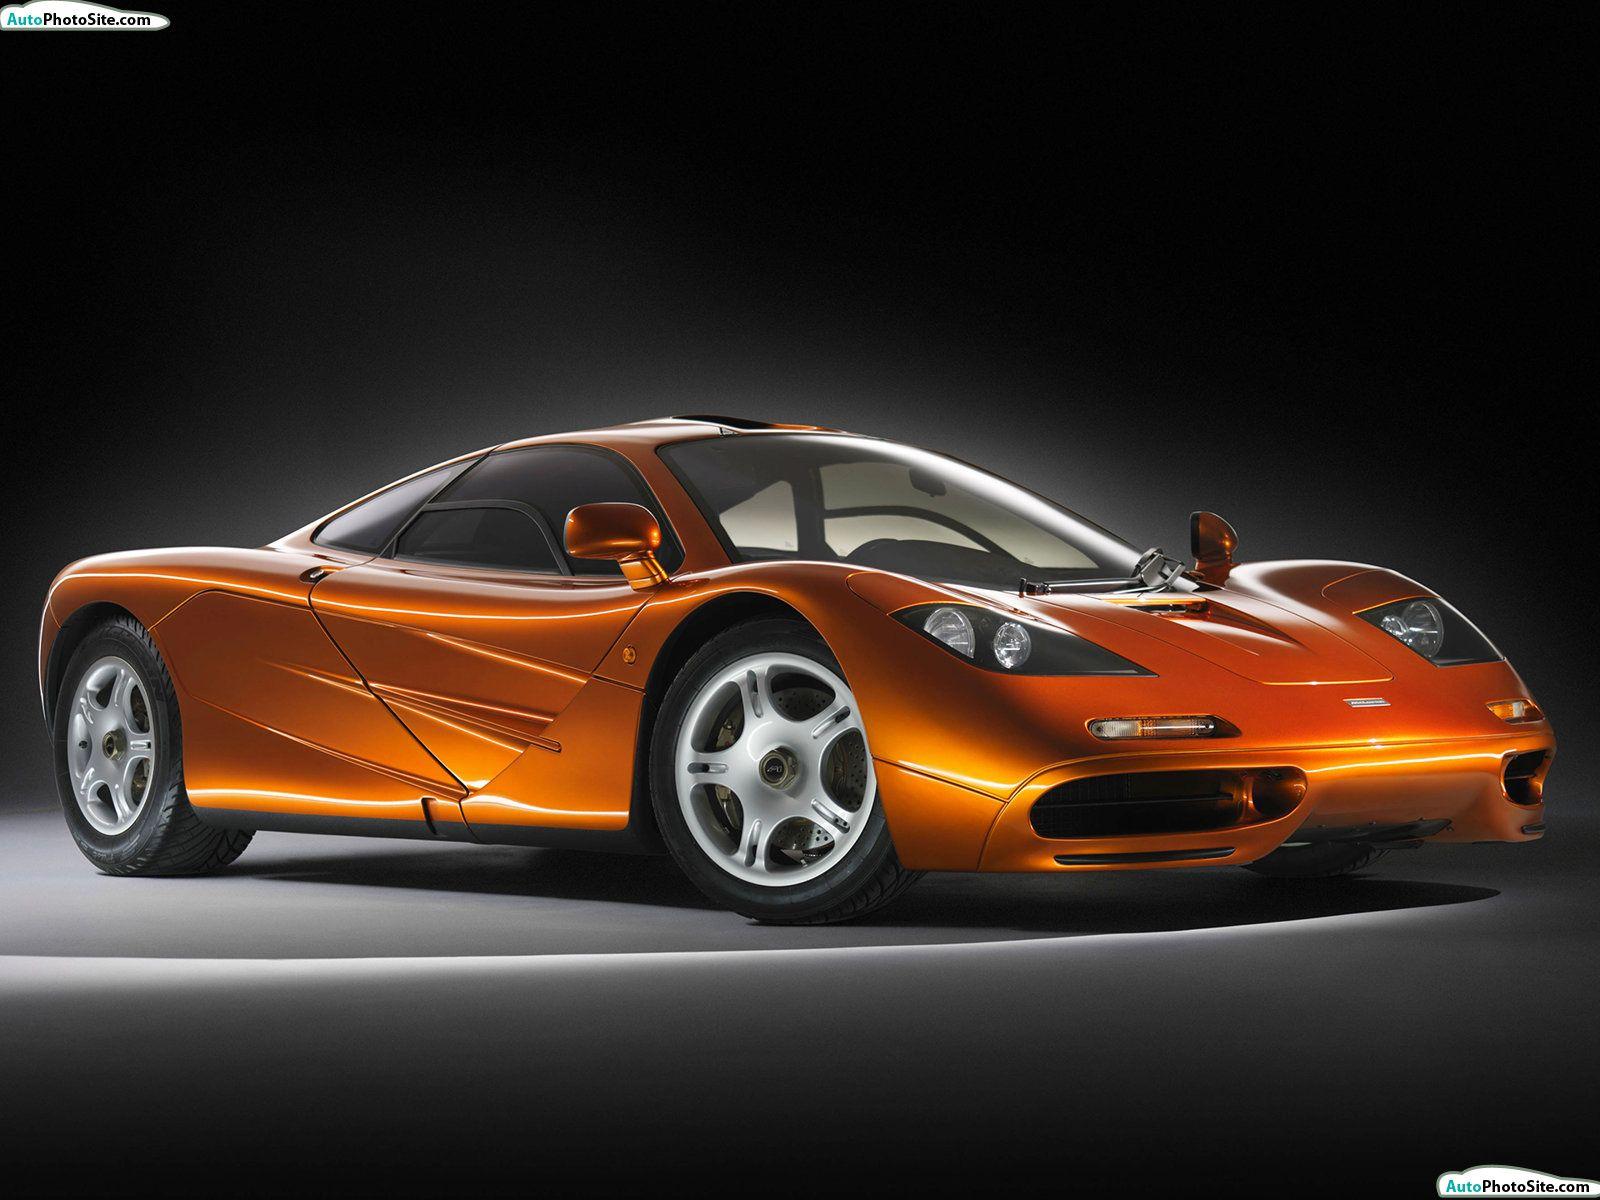 Mclaren F1 Fast An Furious Mclaren F1 Sports Car Super Cars